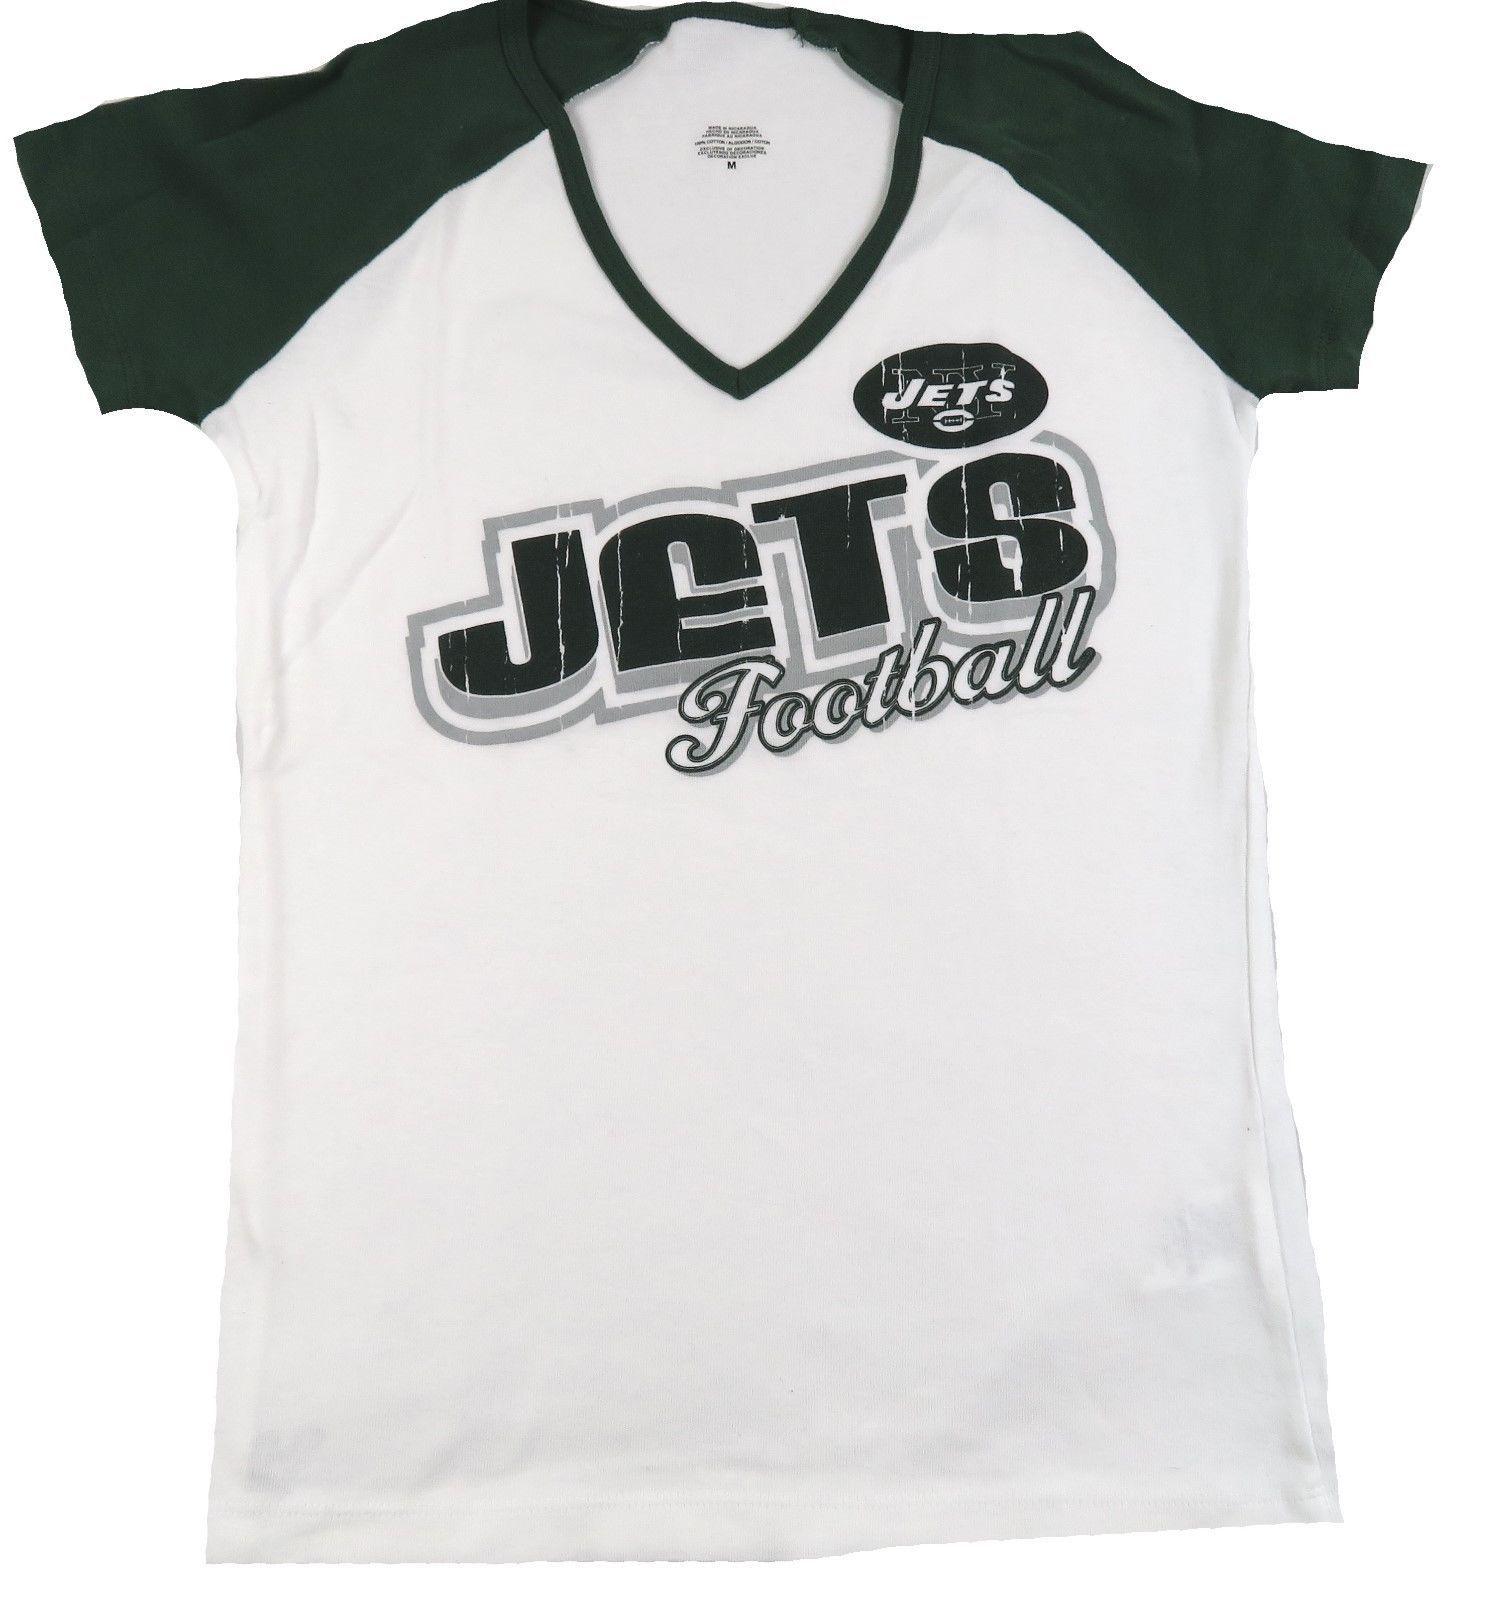 Medium New York Jets Shirt Women's Short Sleeve Deep V-neck Tee Crackle Print